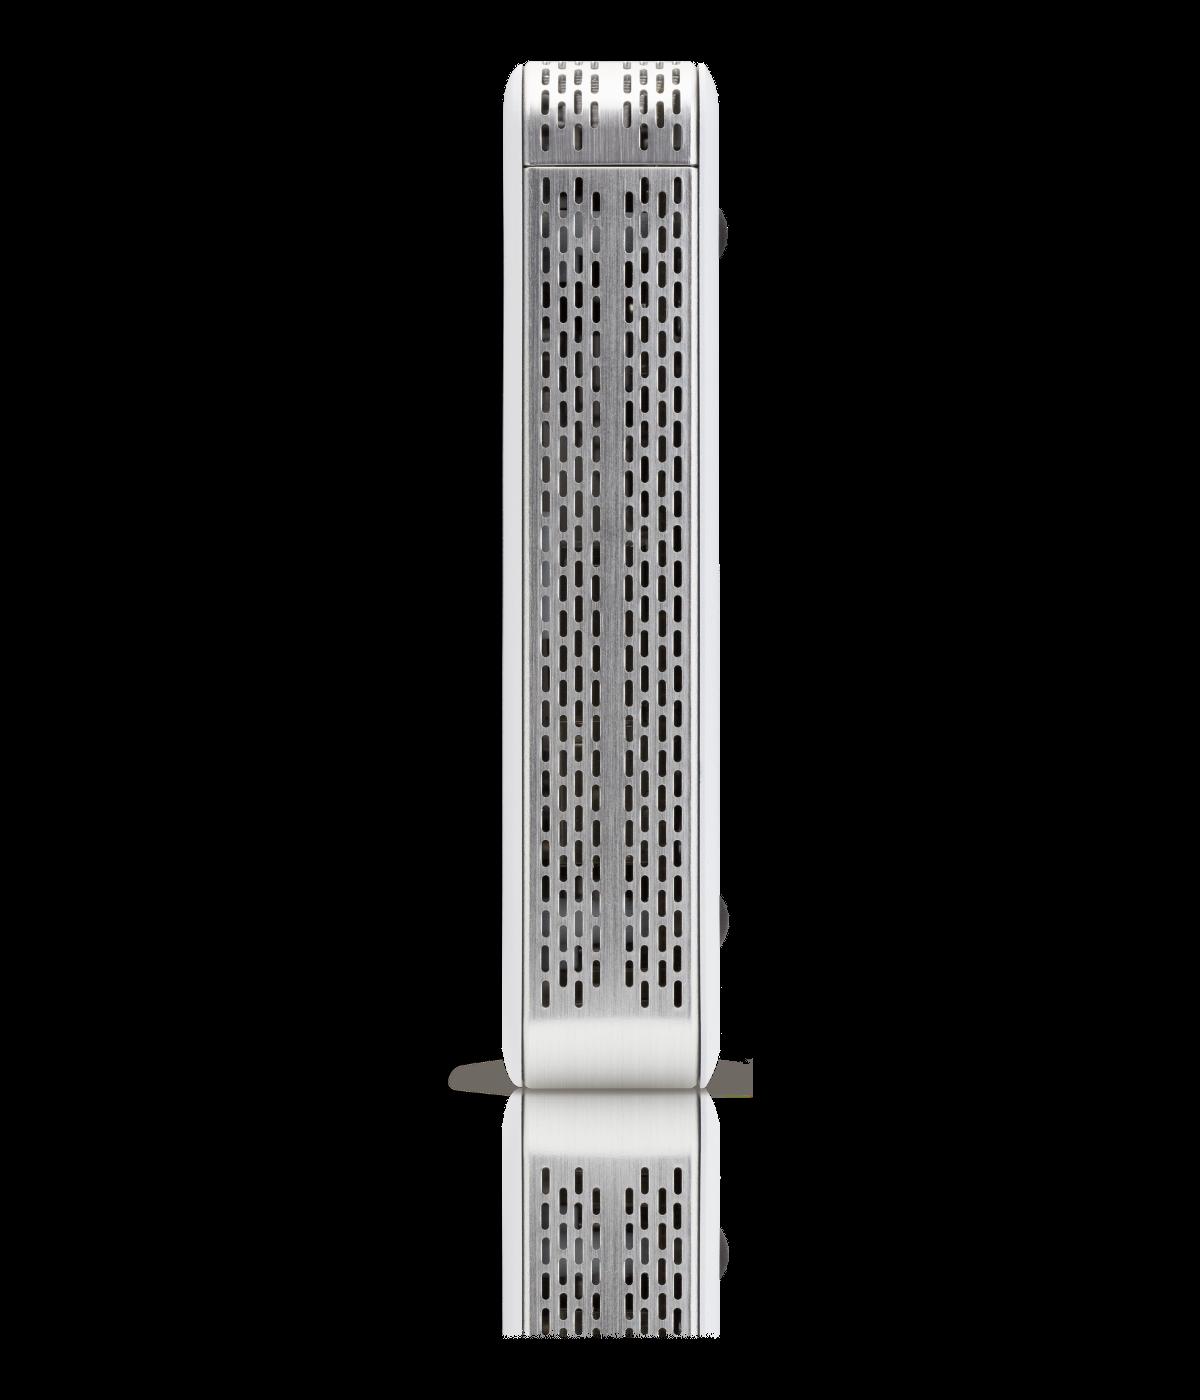 Ubiquiti UniFi Security Gateway, USG